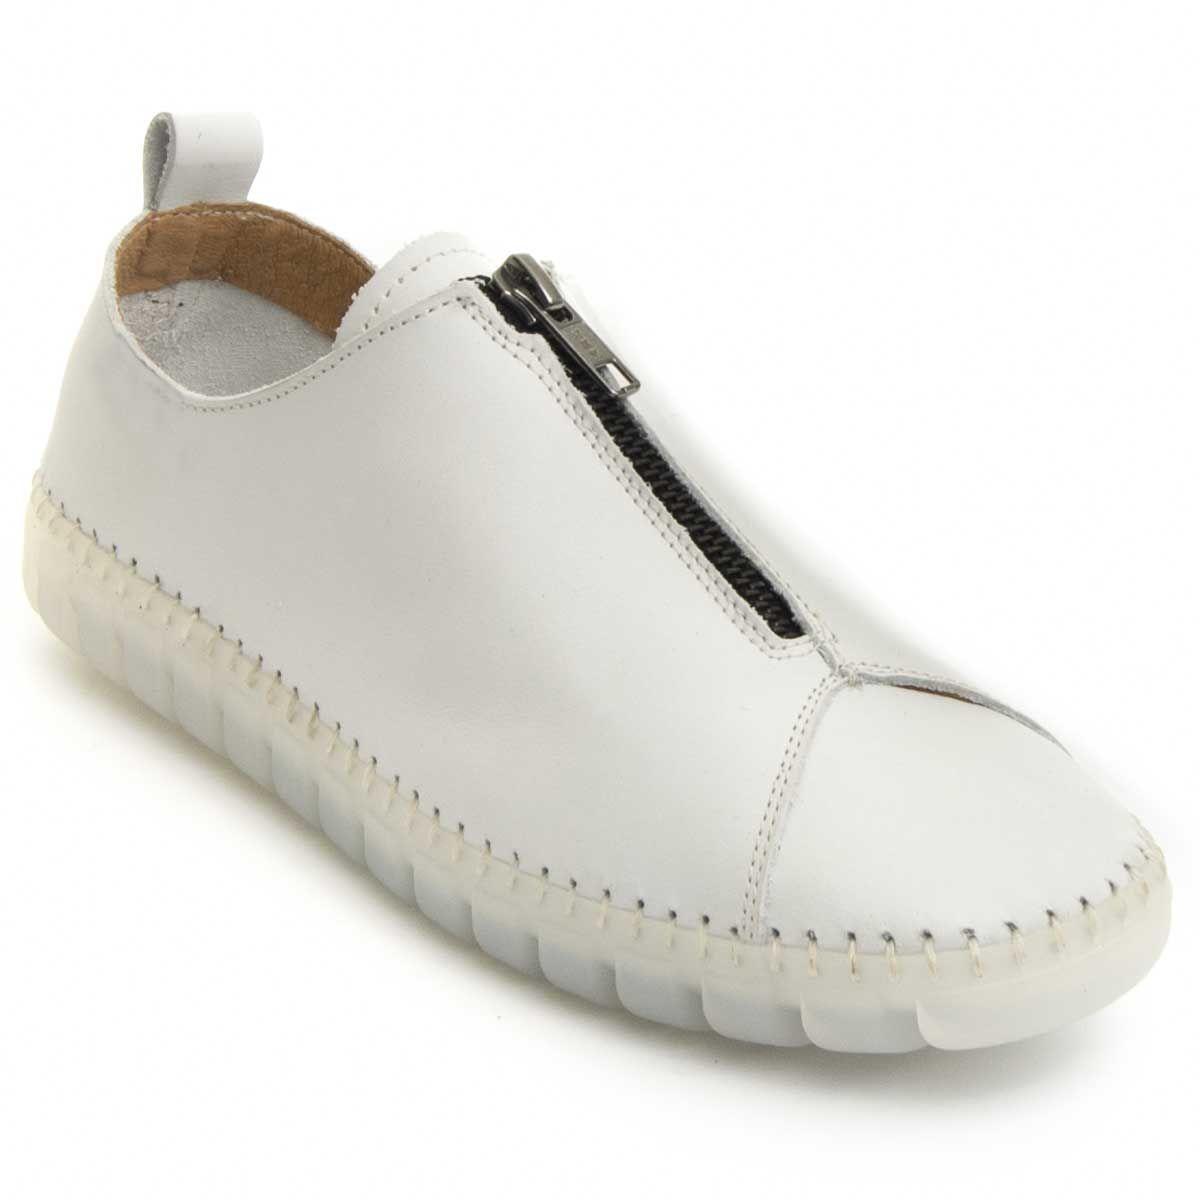 Purapiel Comfortable Moccasin in White